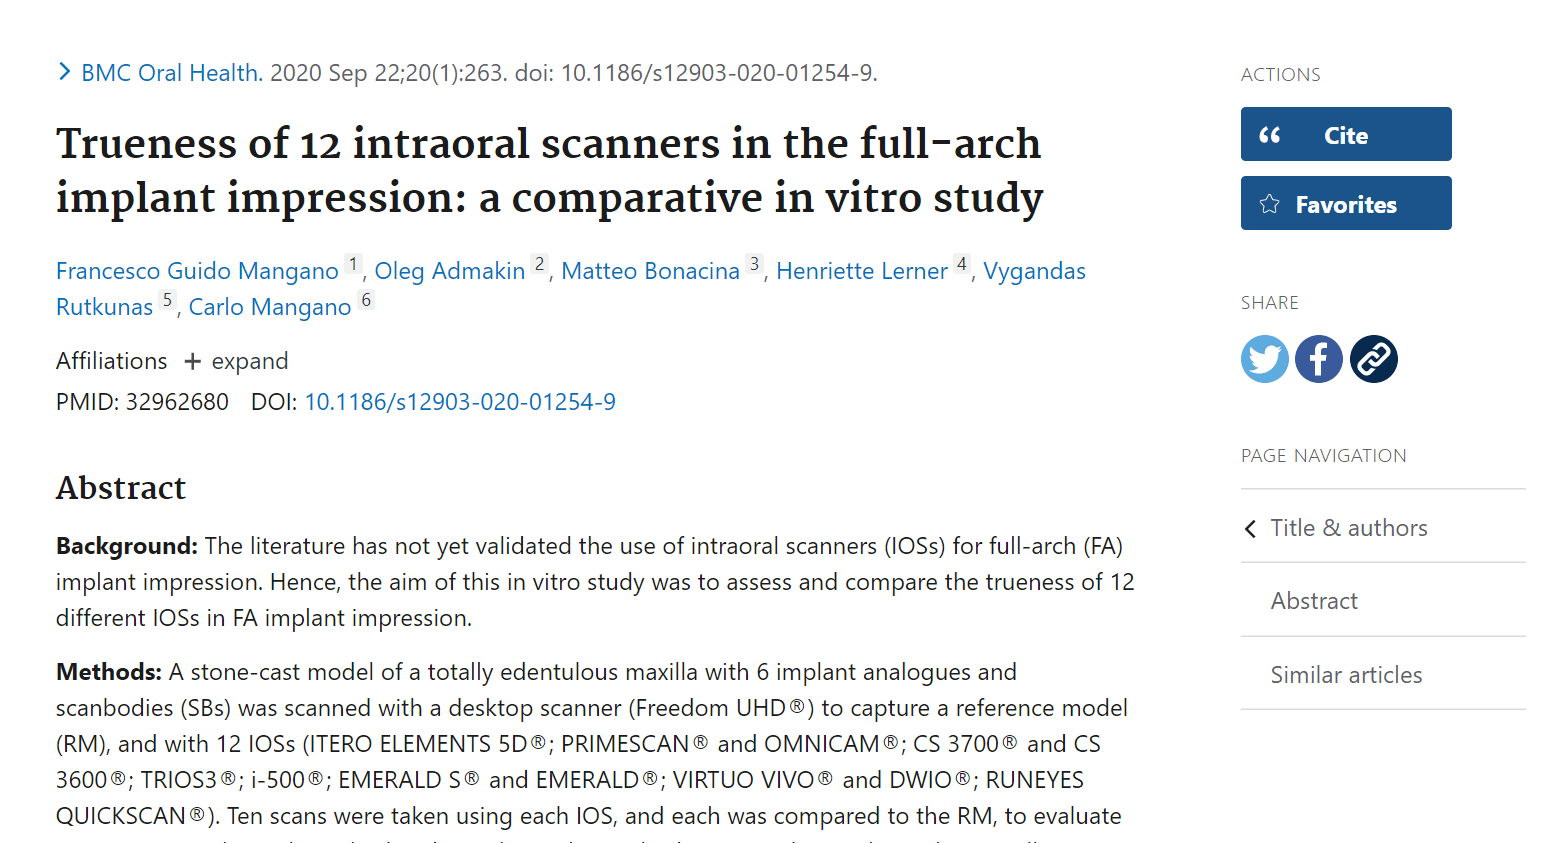 PUBMED INTRAORAL SCANNER STUDY